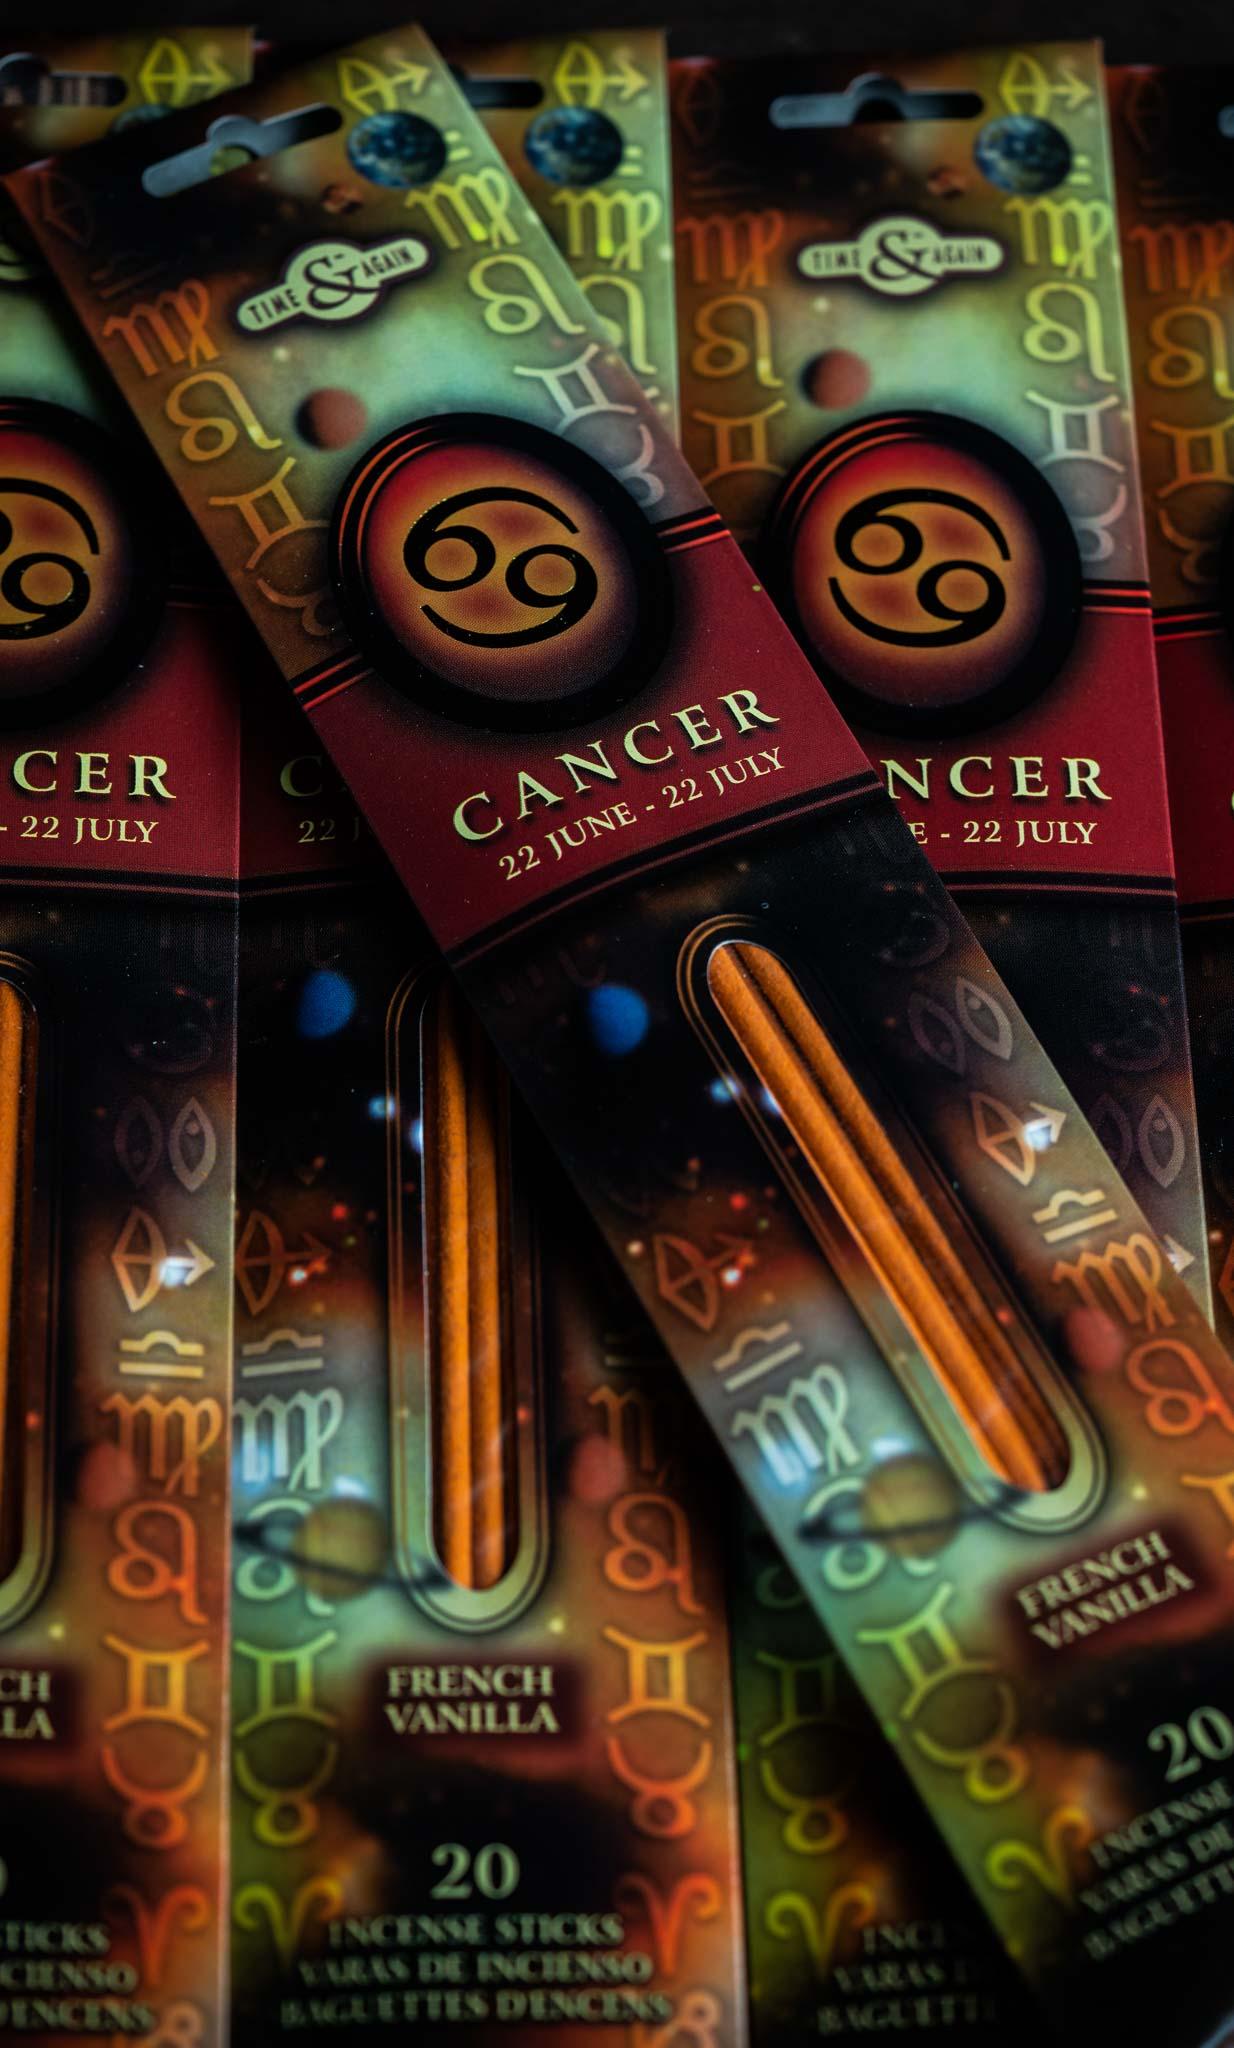 Zodiac Incense Sticks Cancer - French Vanilla